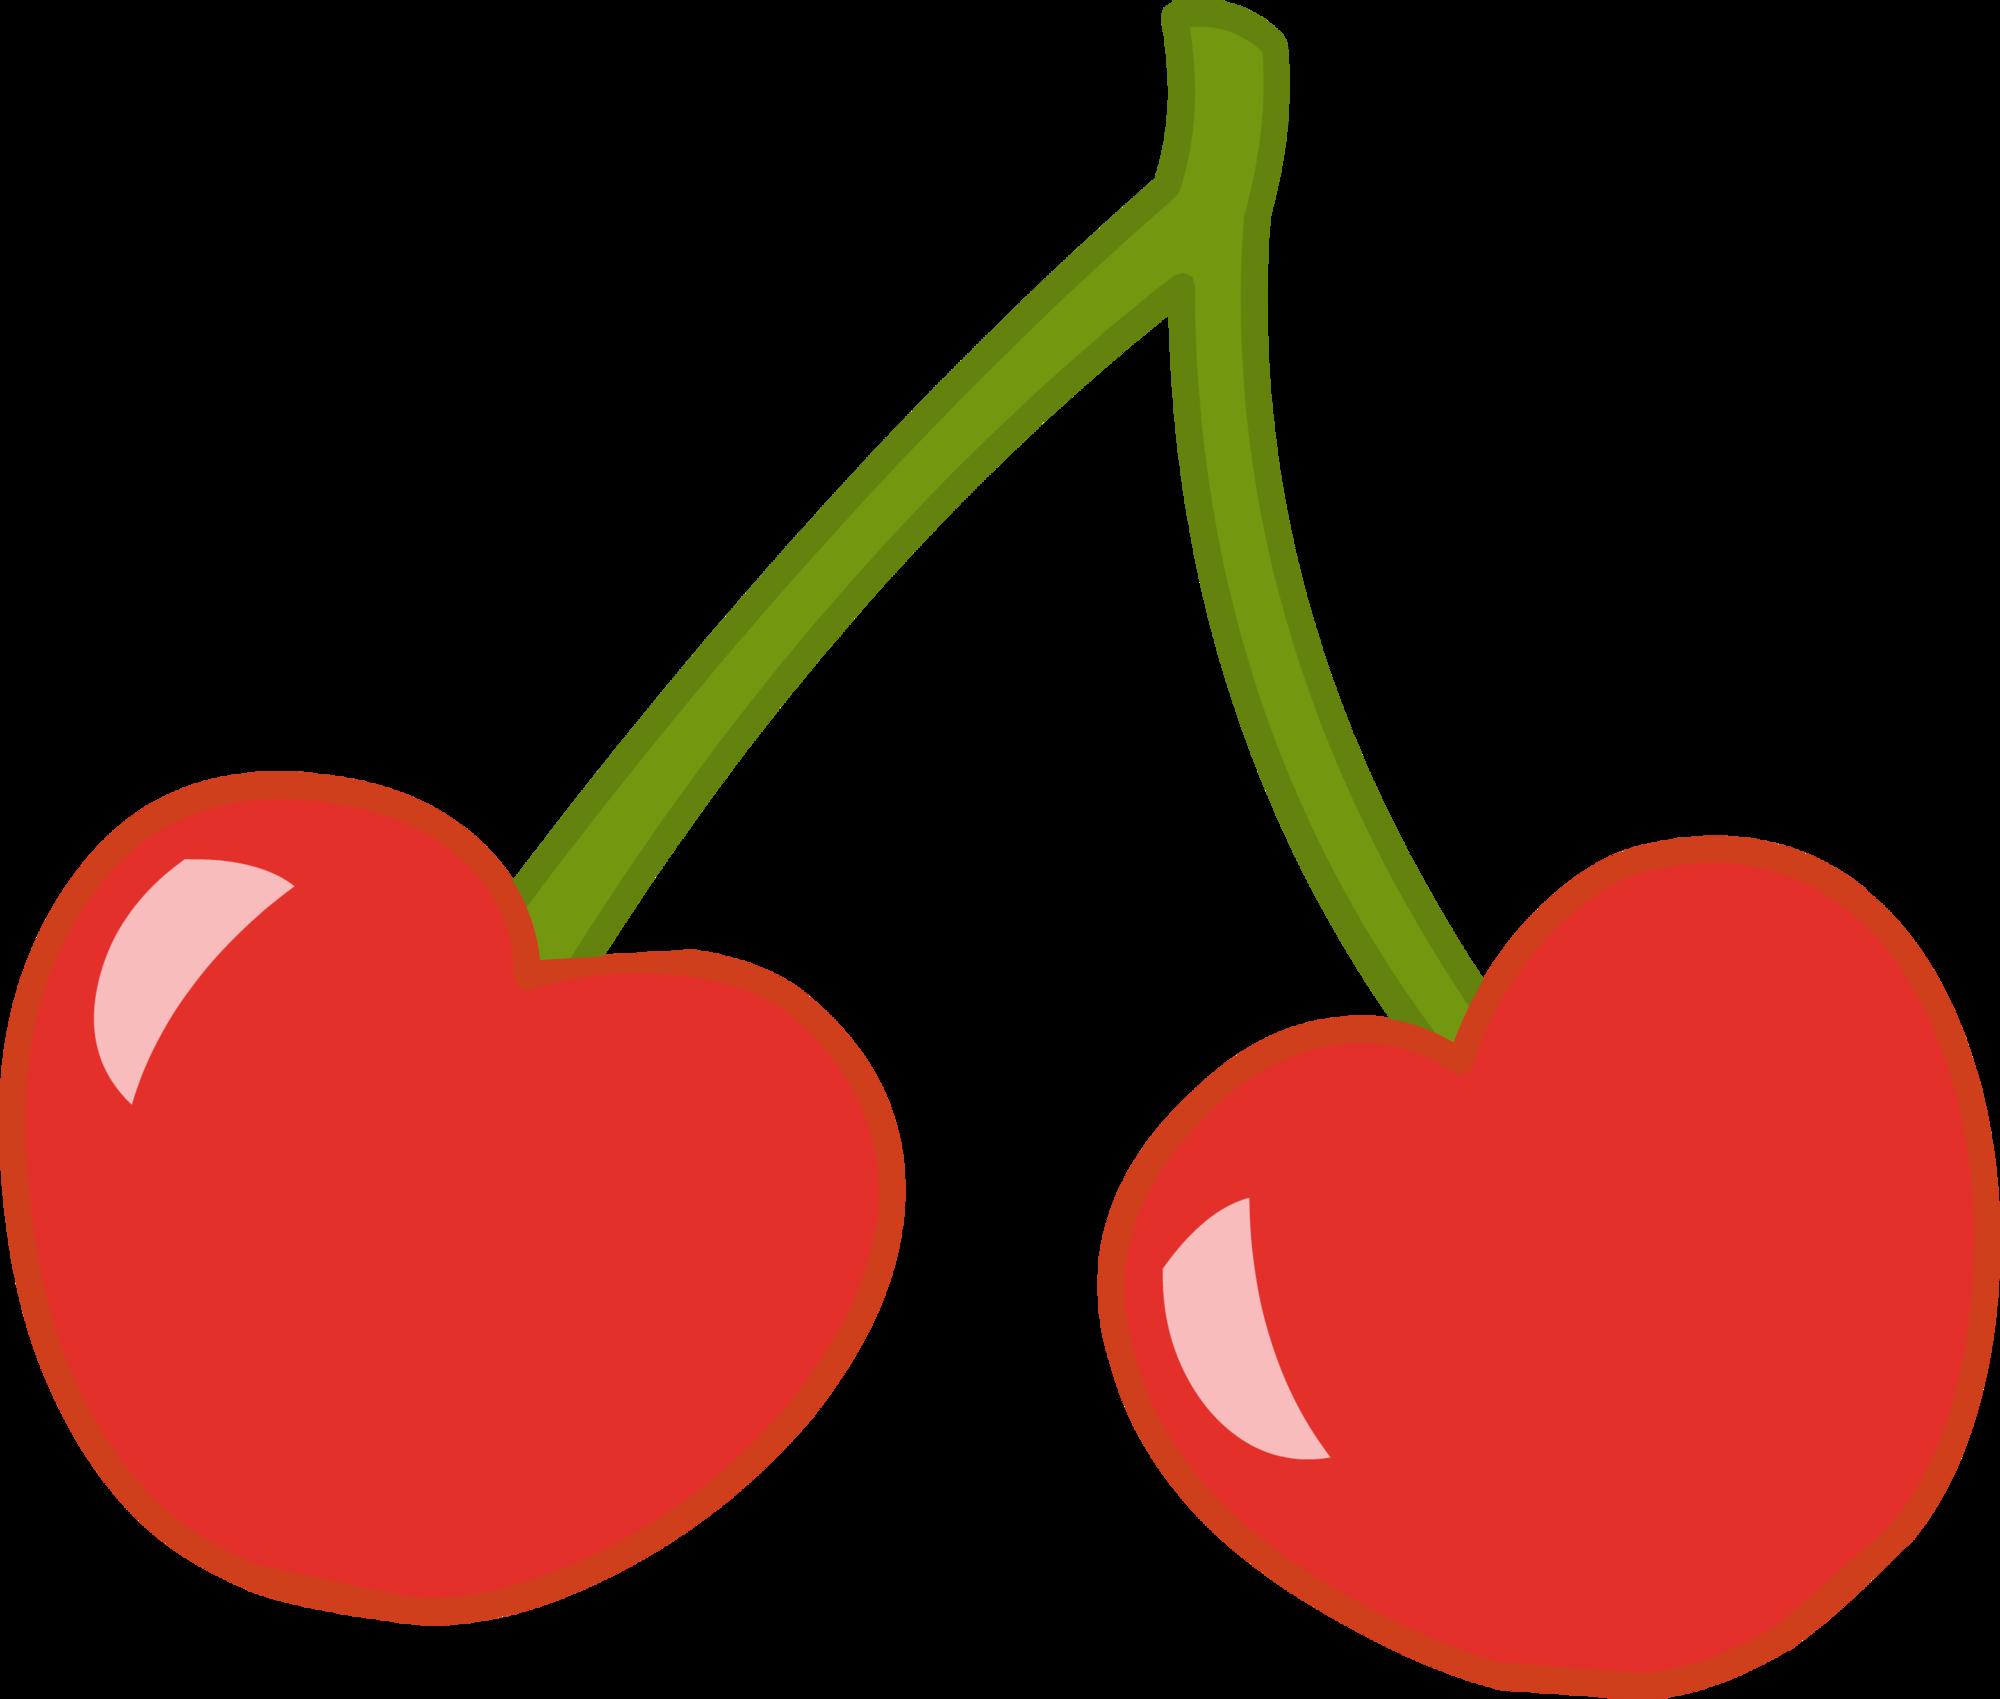 royalty free download Cherries clipart pacman. Image happystudio cherry png.